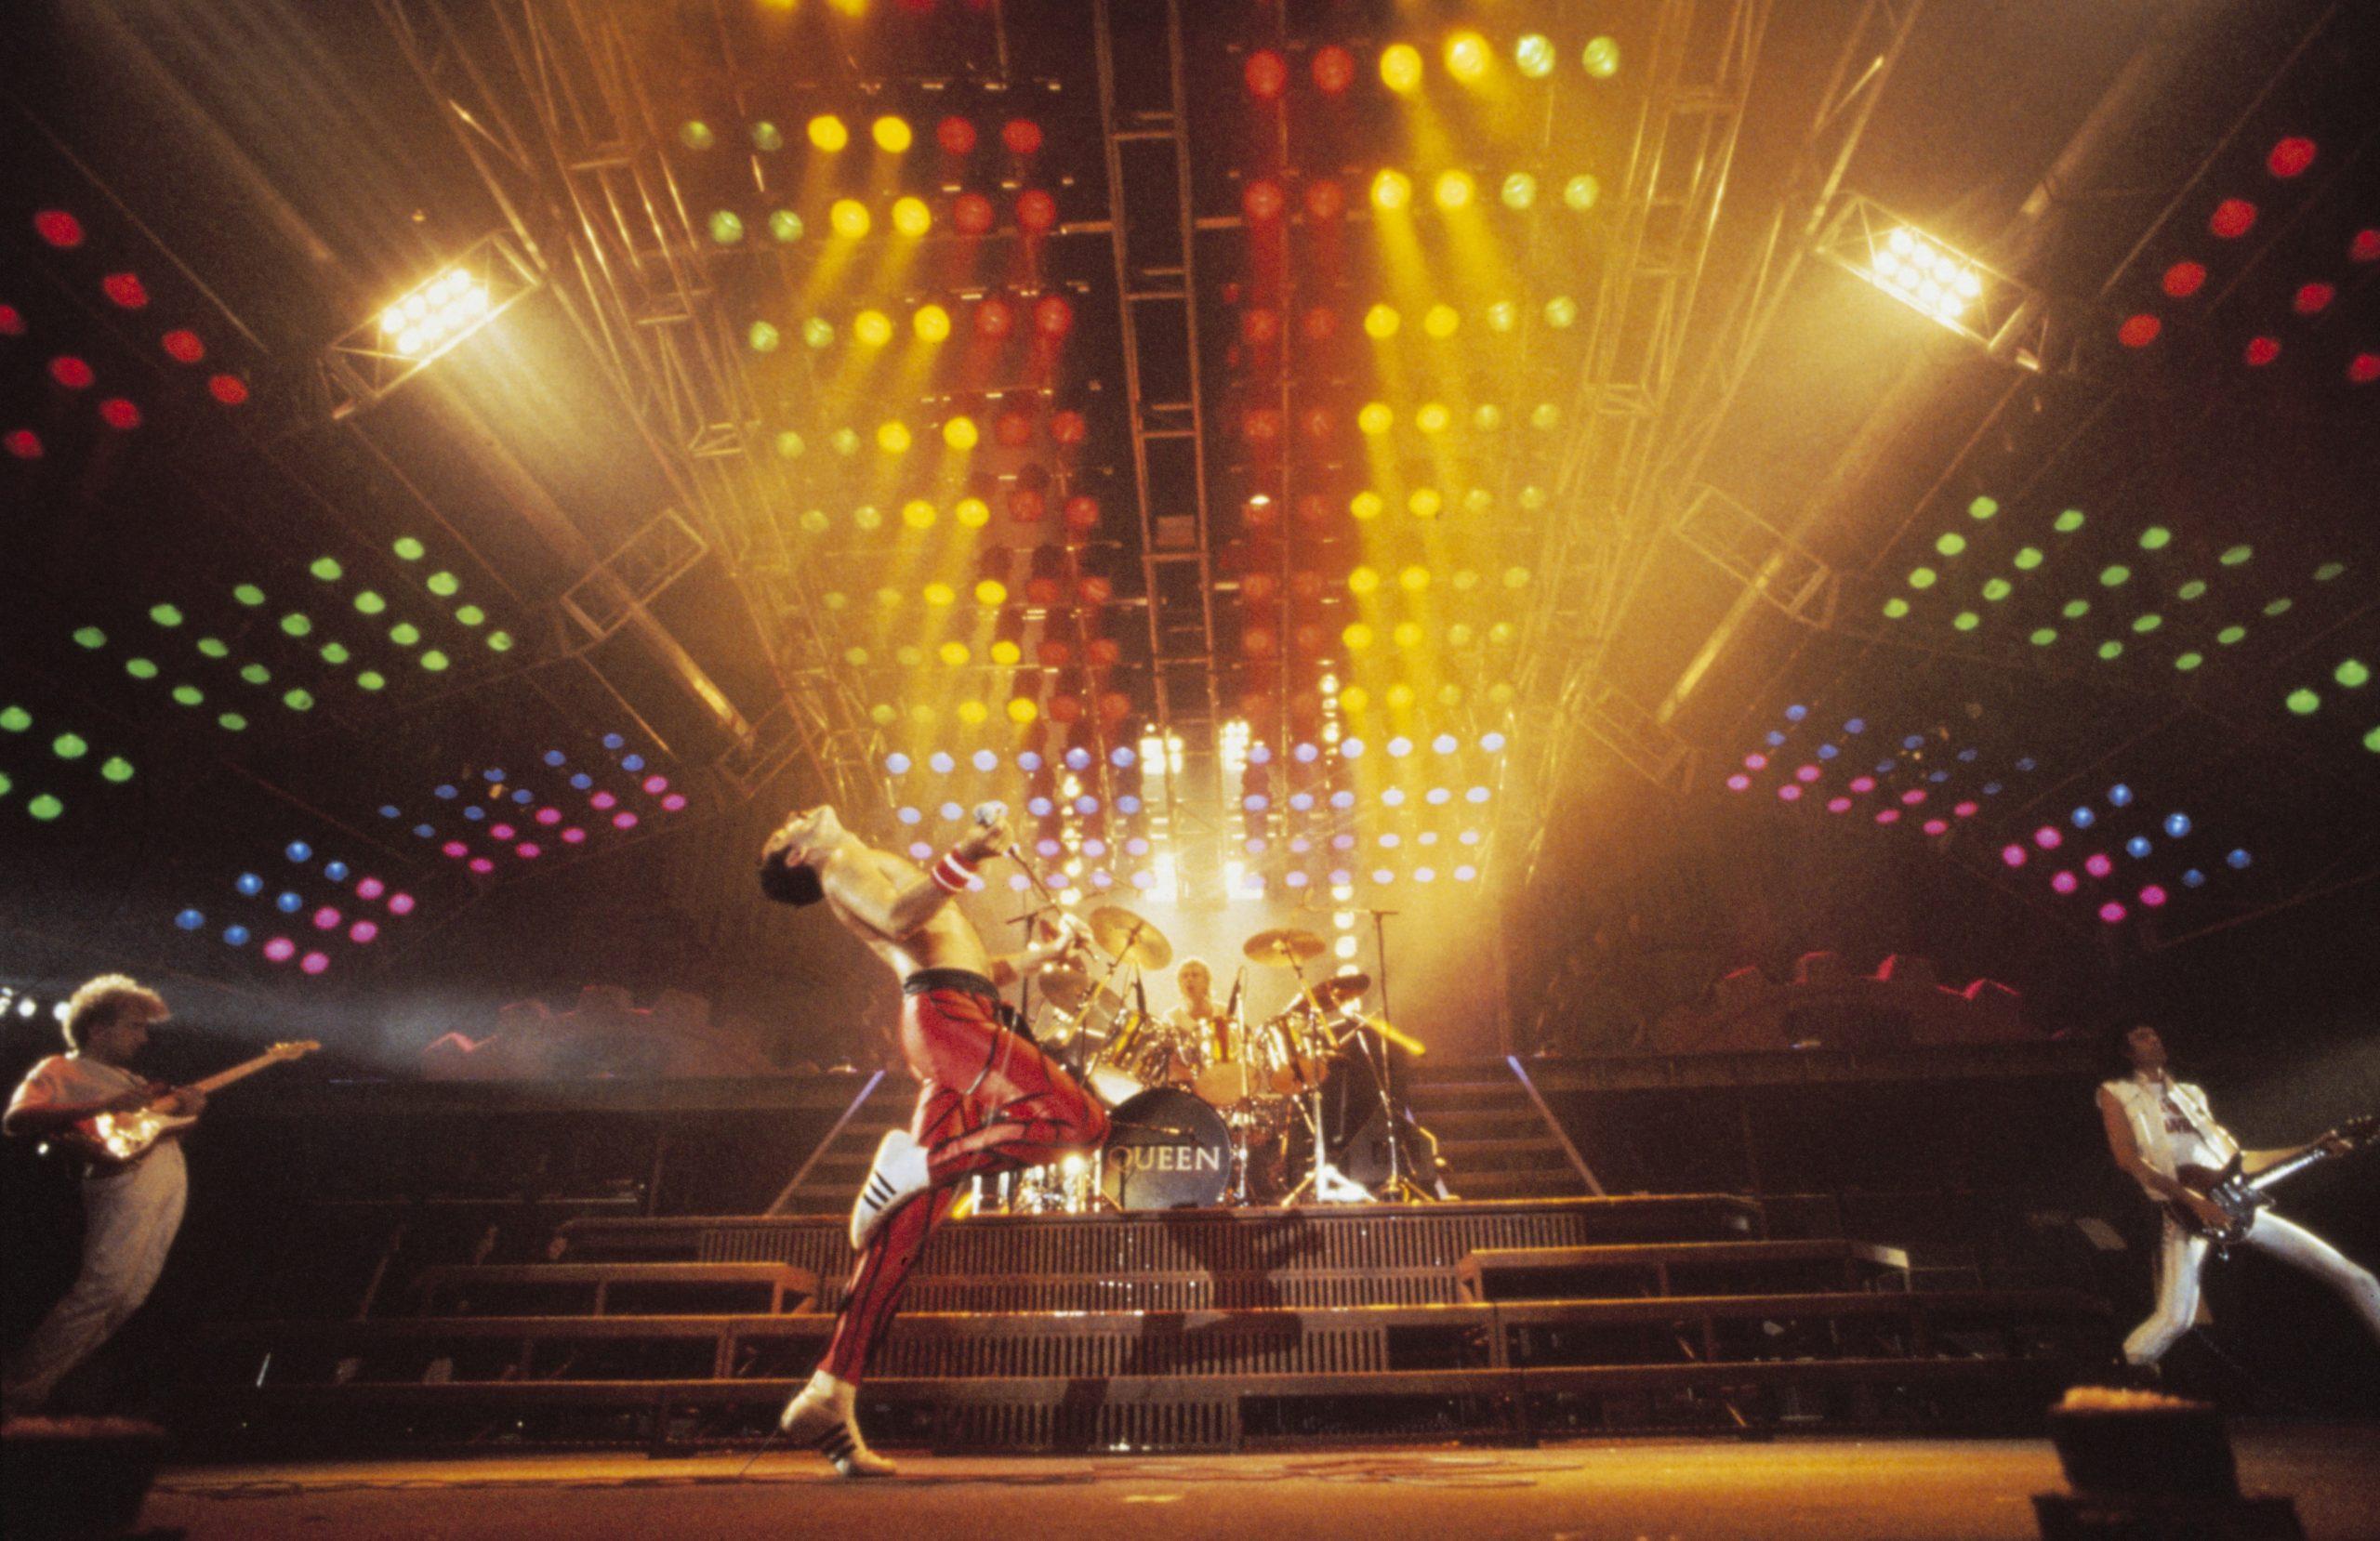 queen-photo-by-denis-oregan-queen-productions-ltd-taken-at-nec-birmingham-during-the-works-tour-1984